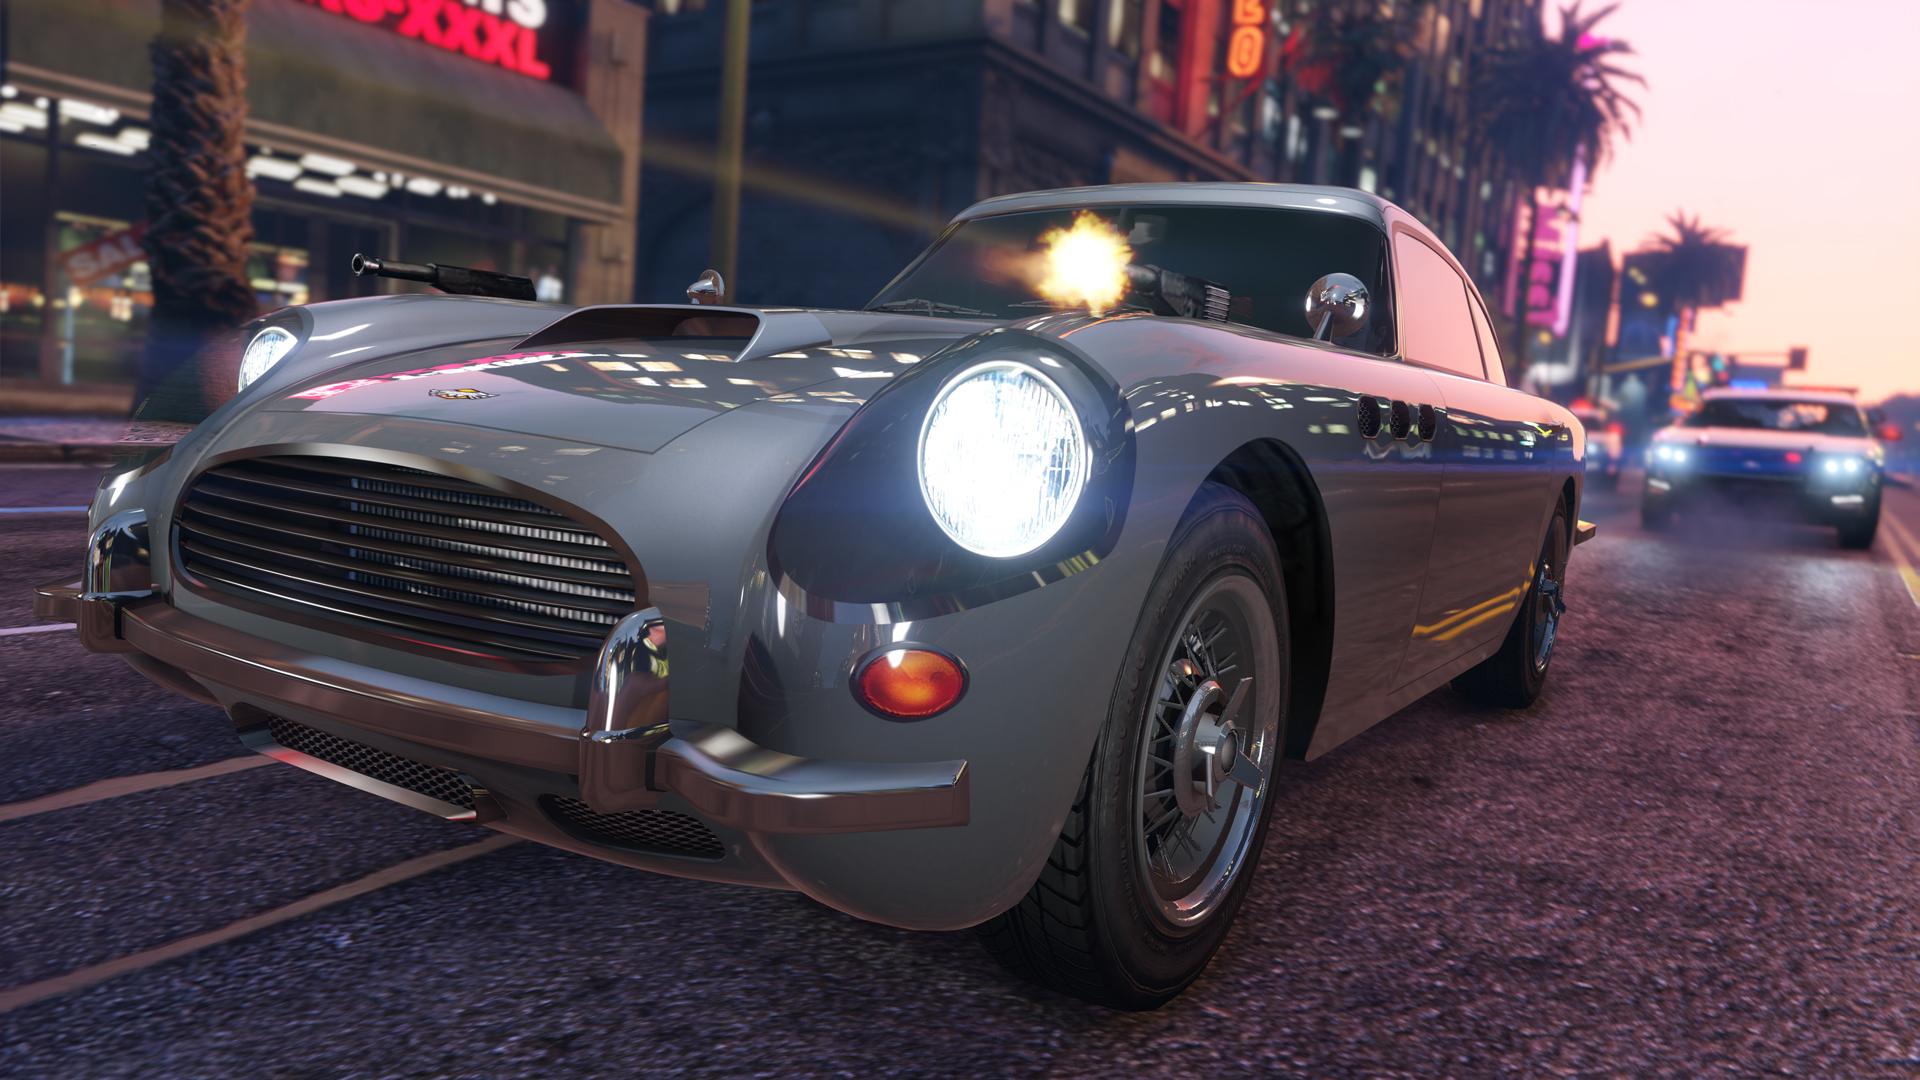 Video Game Grand Theft Auto V 1920x1080